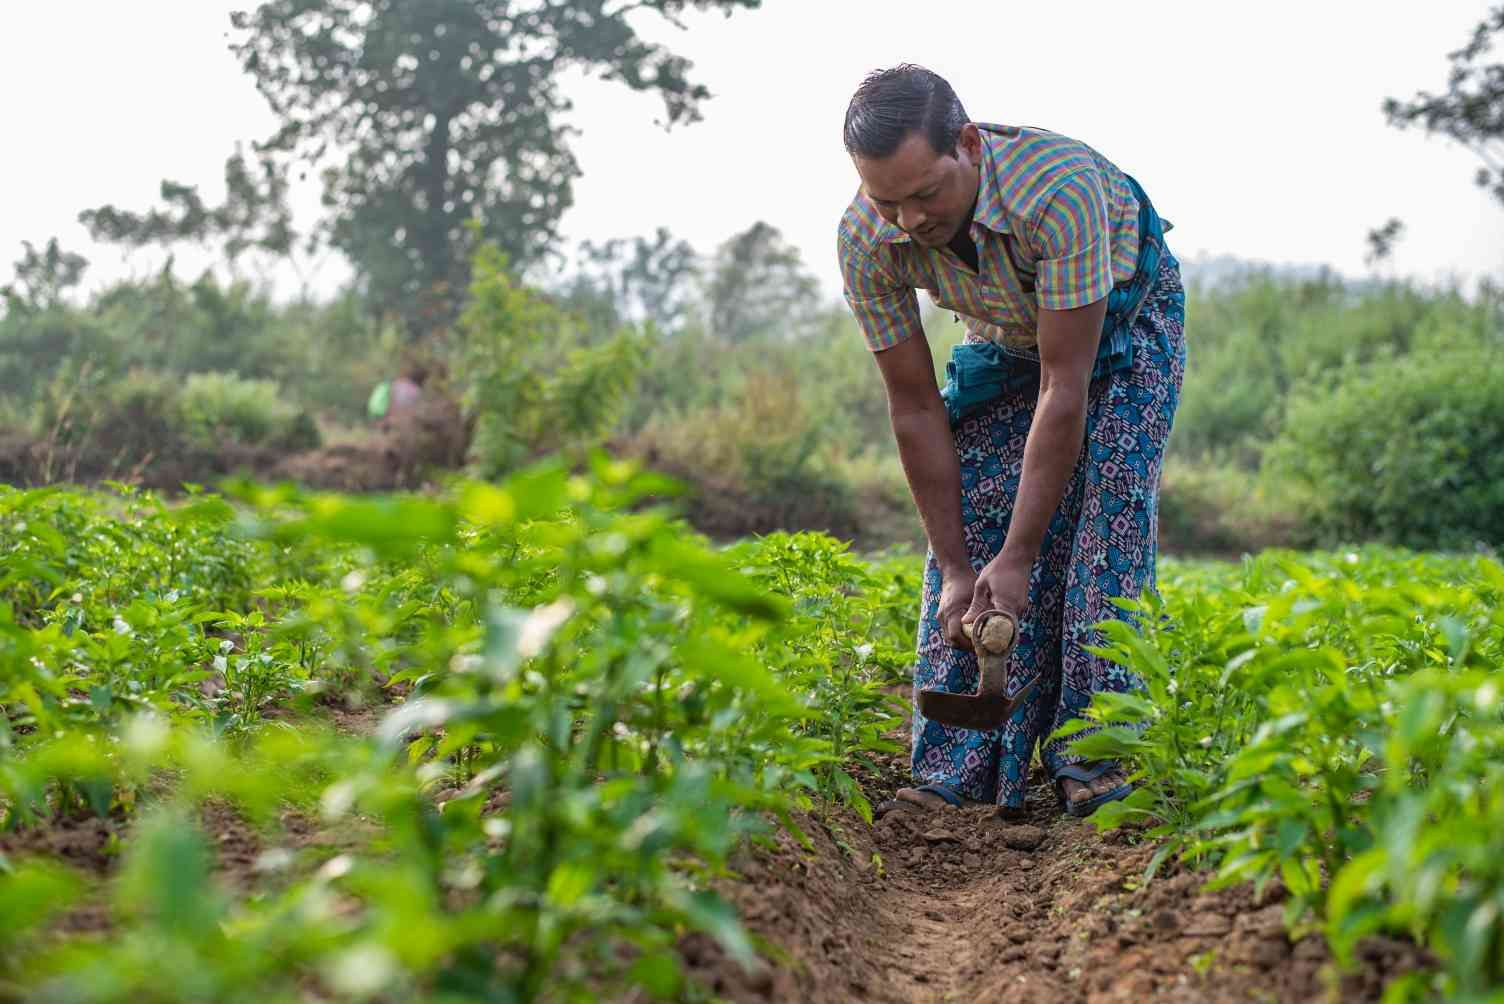 farmer working on a field in orissa-rural india